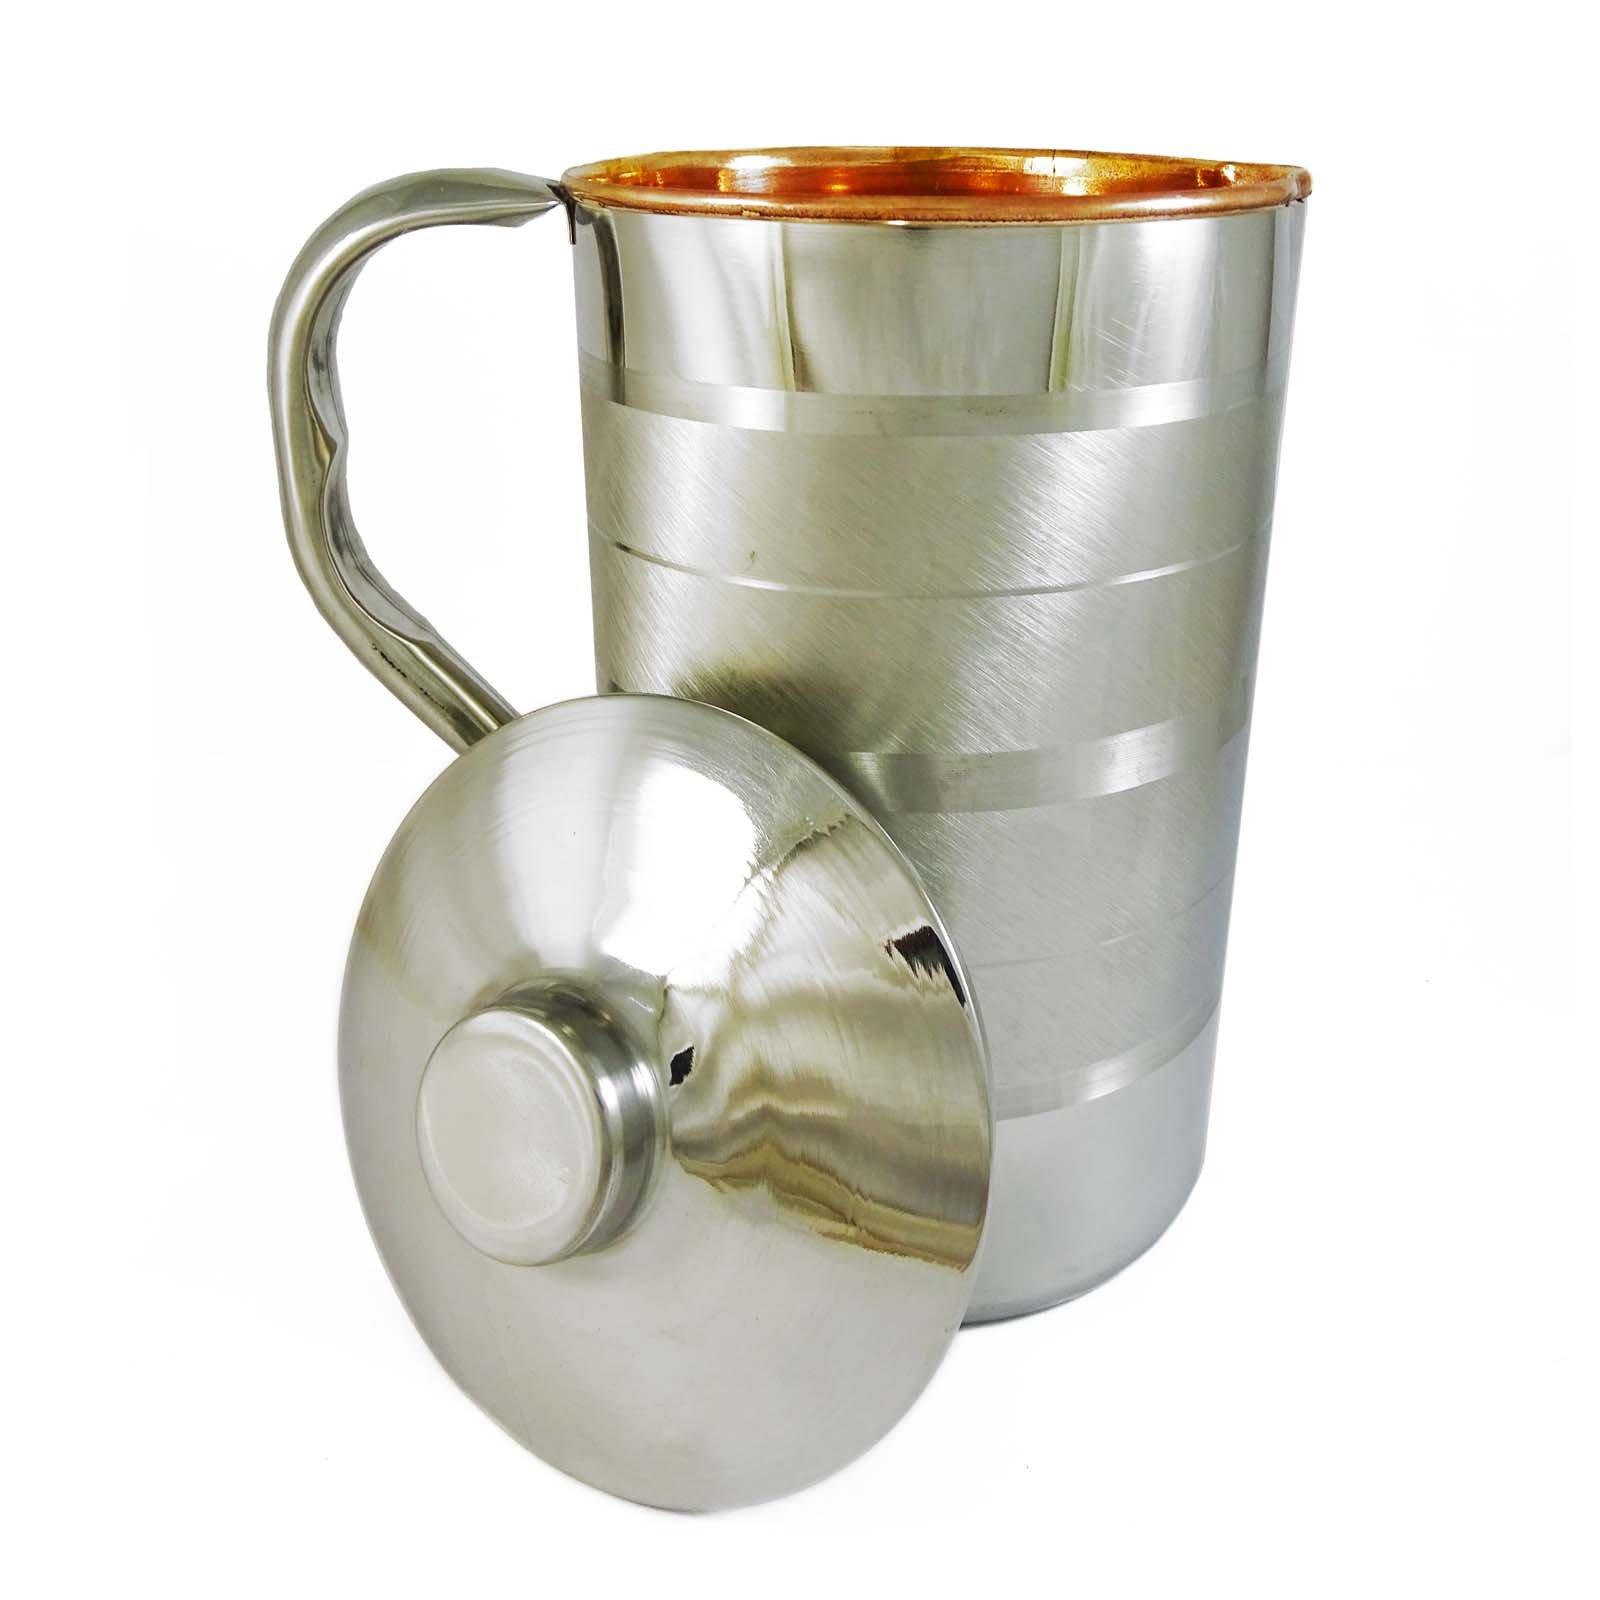 ibaexports Tableware Traditional Serving Ayurvedic Copper Steel Kitchenware Water Jug by ibaexports (Image #1)